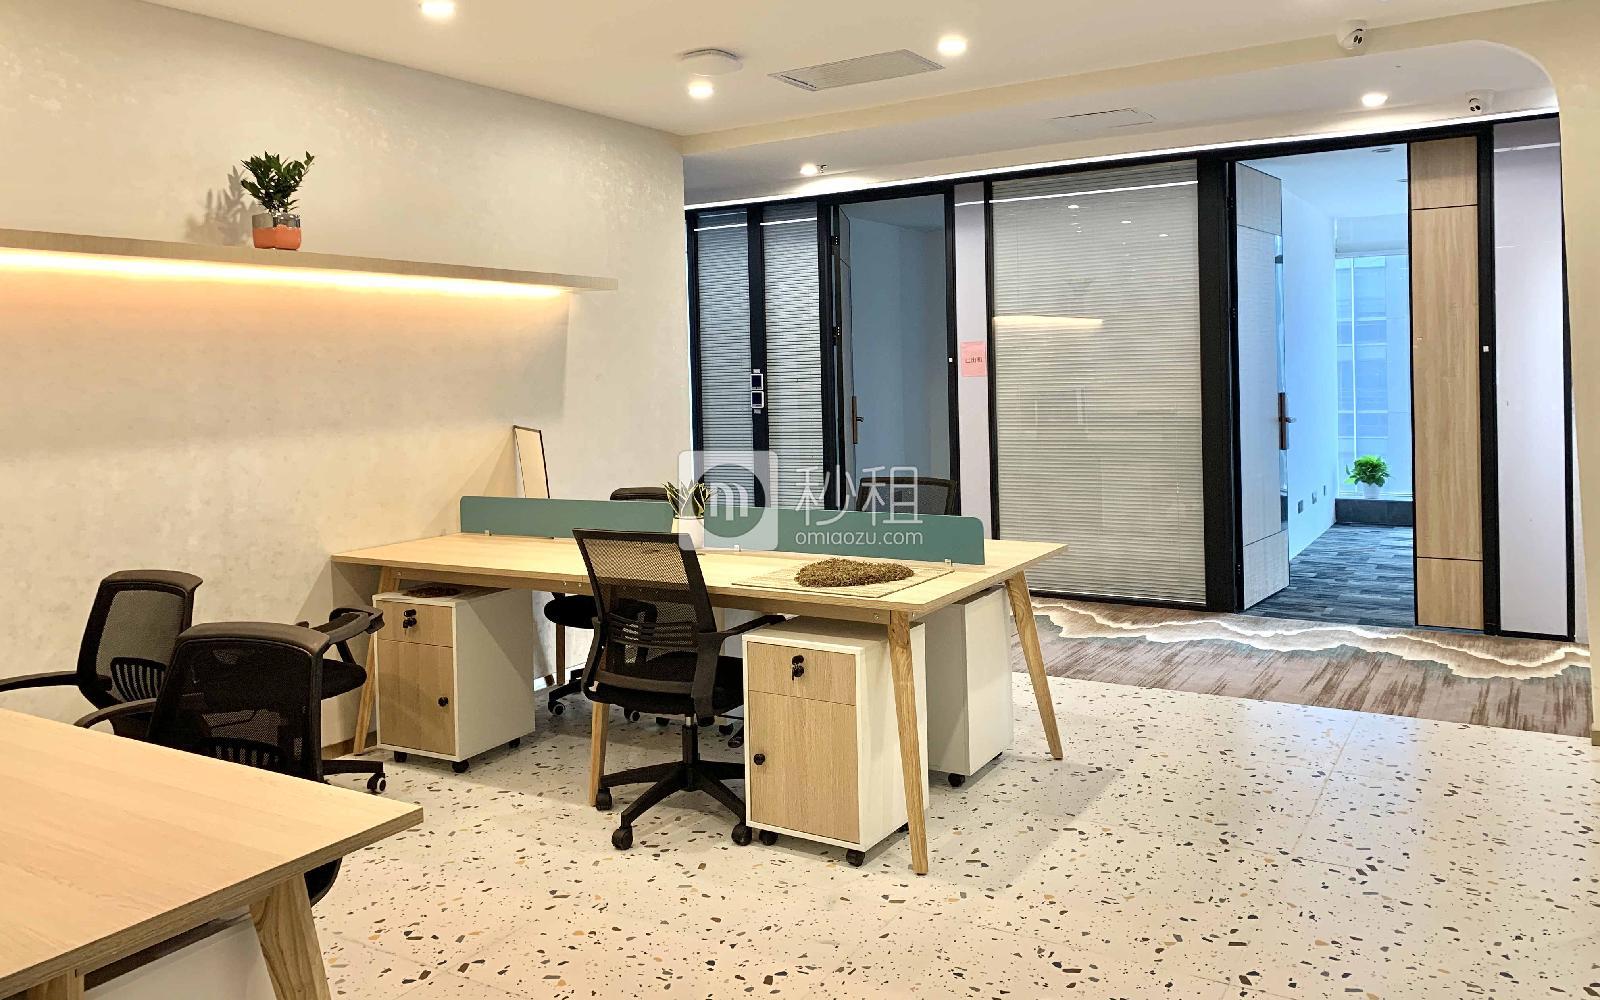 X-VALUE联合办公-豪威科技大厦写字楼出租10平米豪装办公室998元/工位.月